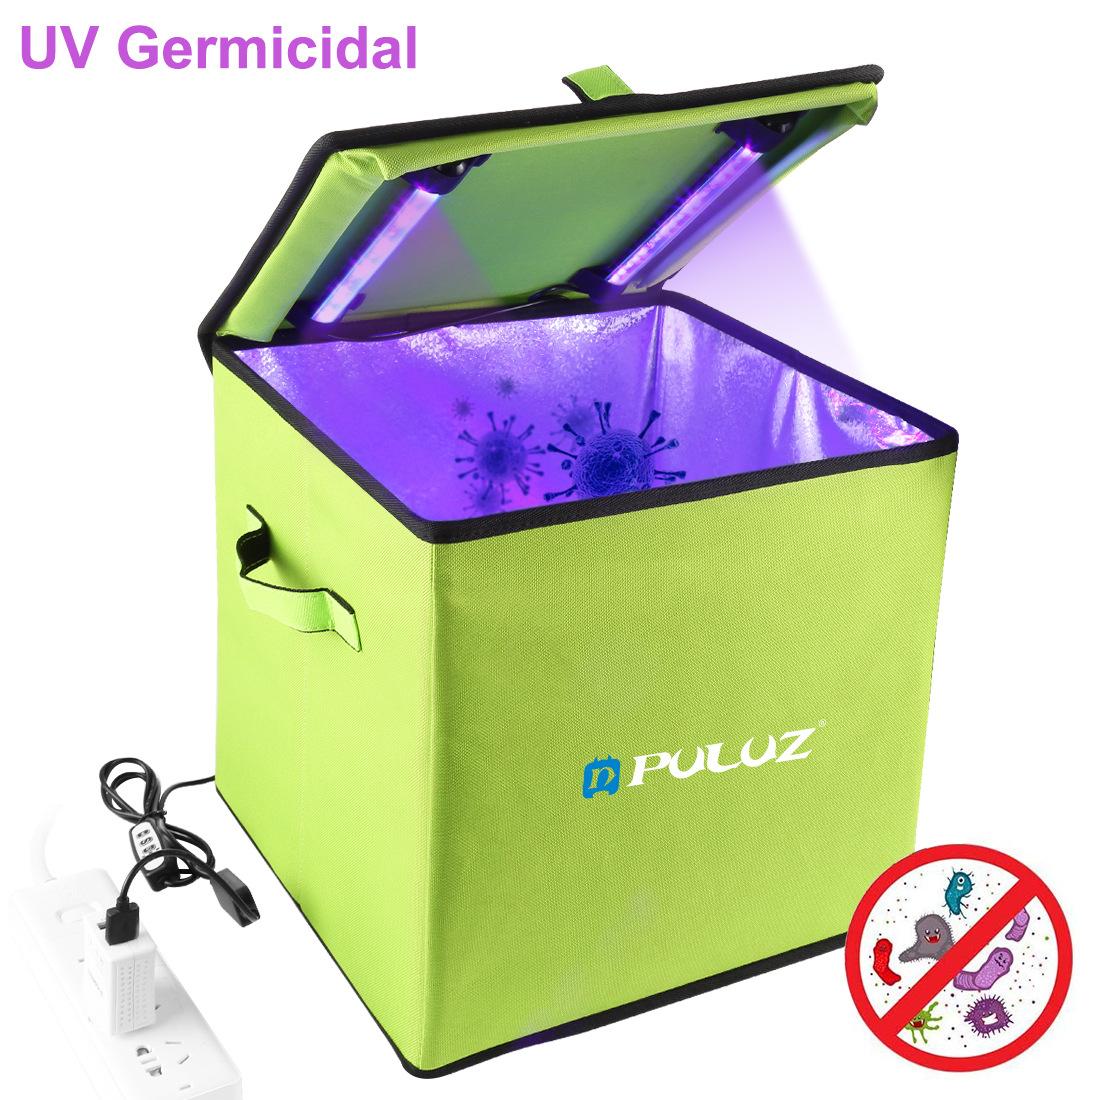 PULUZ 30cm UV Light Germicidal Sterilizer Disinfection Tent Box  green